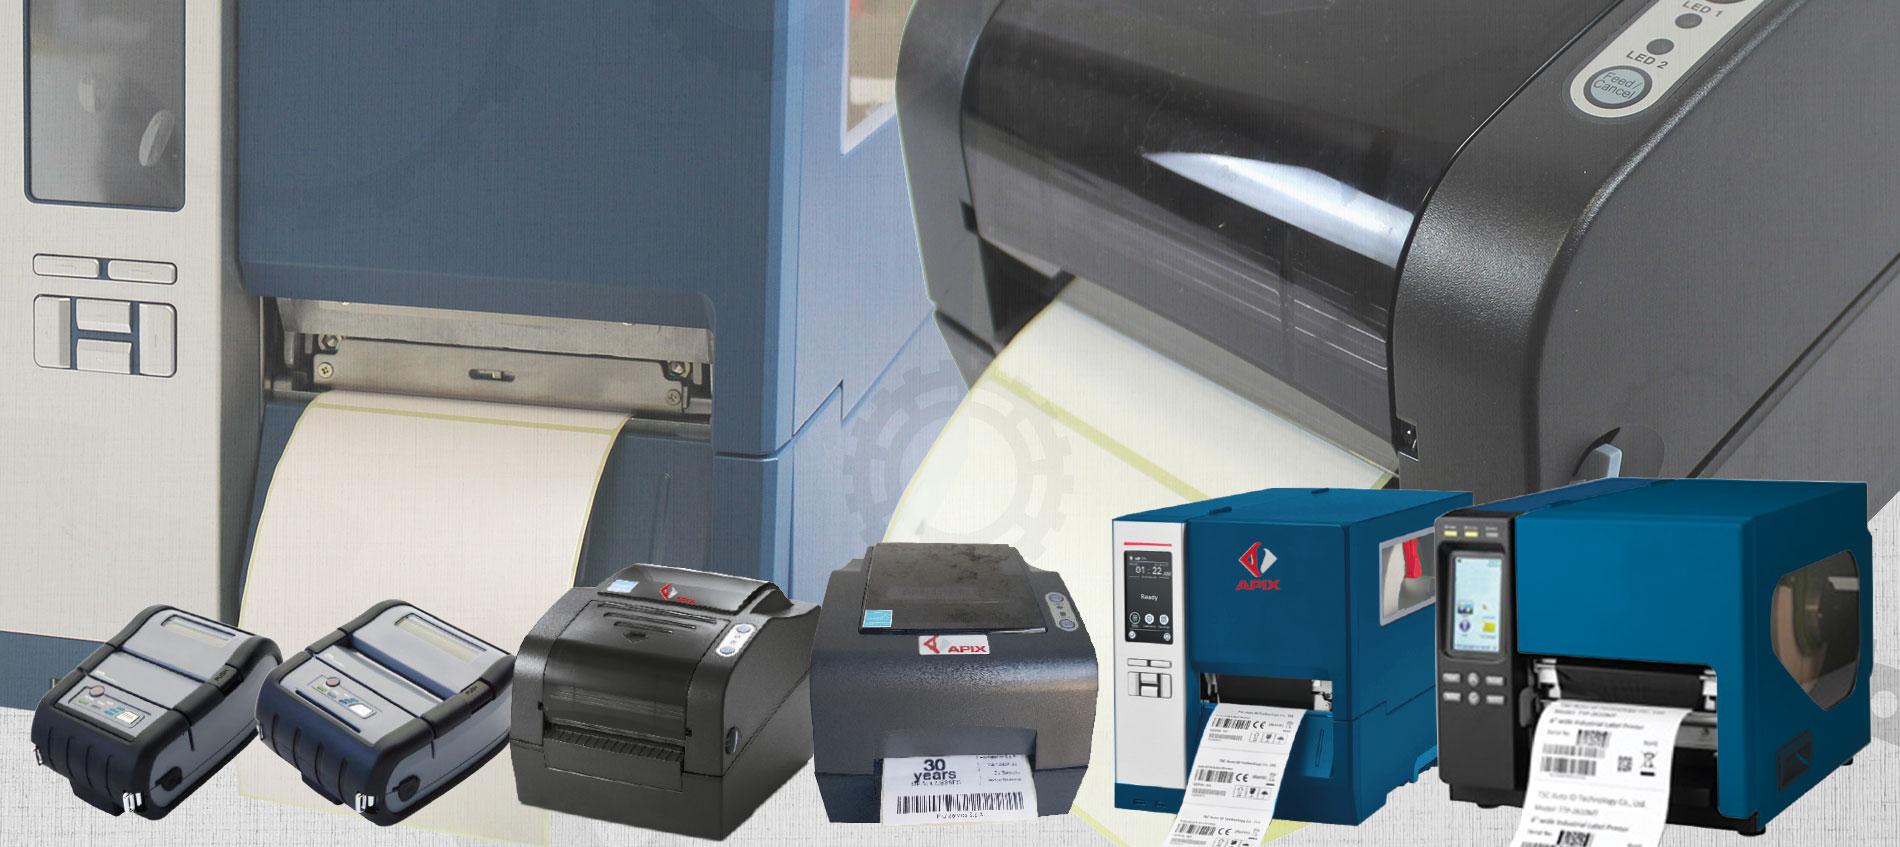 Servizi Raining Labels - soluzioni di stampa